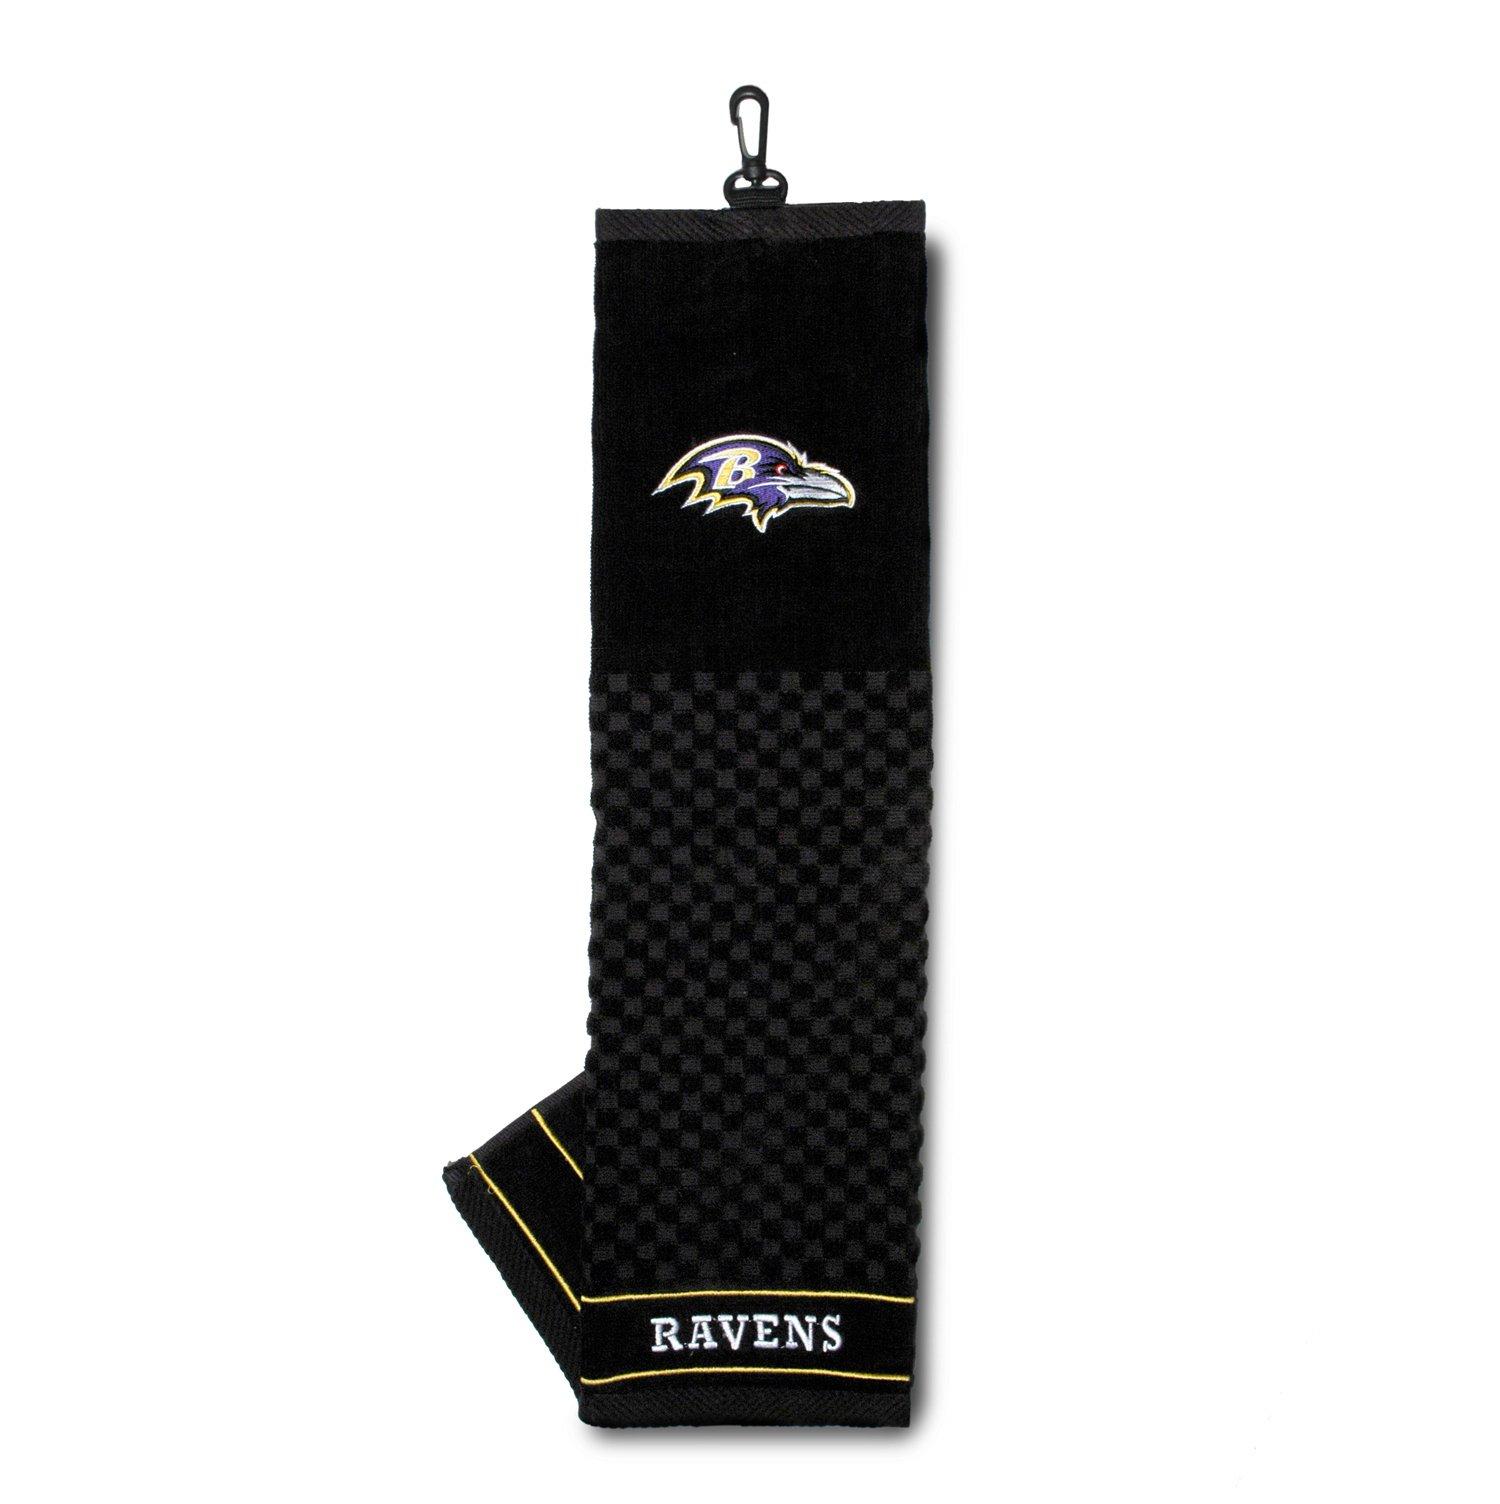 Team Golf NFL Baltimore Ravens Embroidered Golf Towel, Checkered Scrubber Design, Embroidered Logo